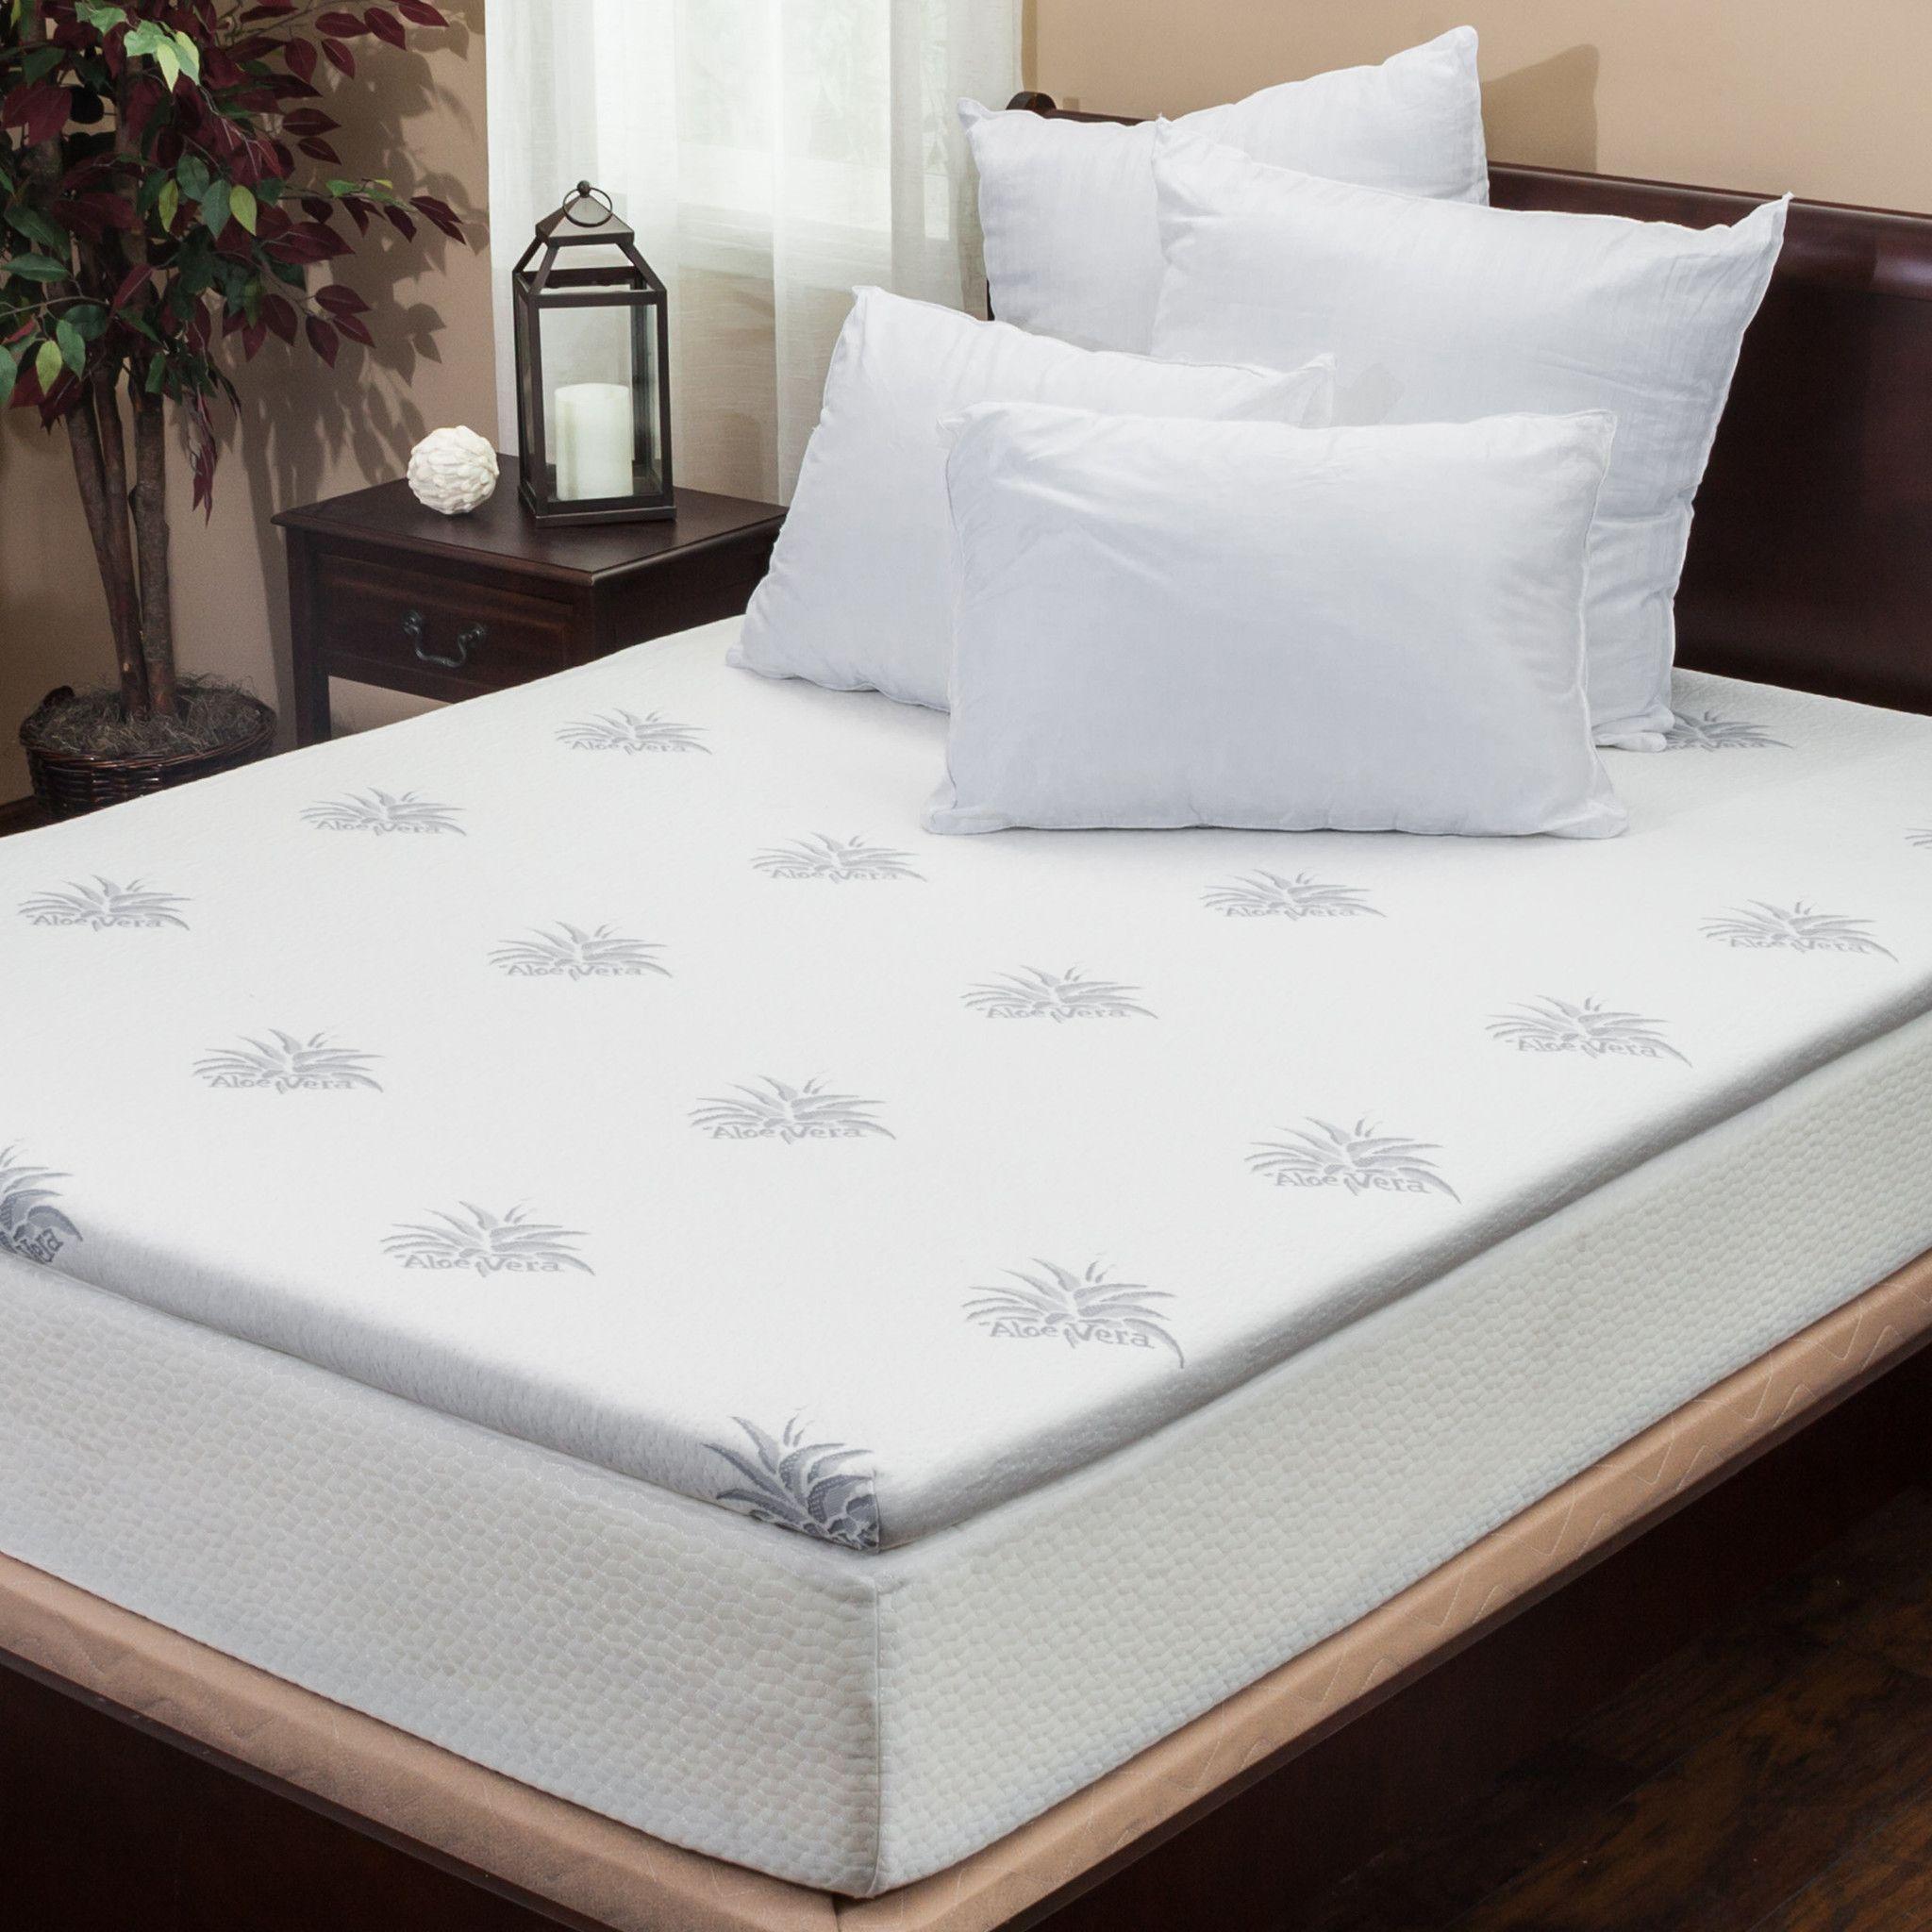 mattress topper sleep memory amazon suretemp fiber dp com inch foam warranty year innovations